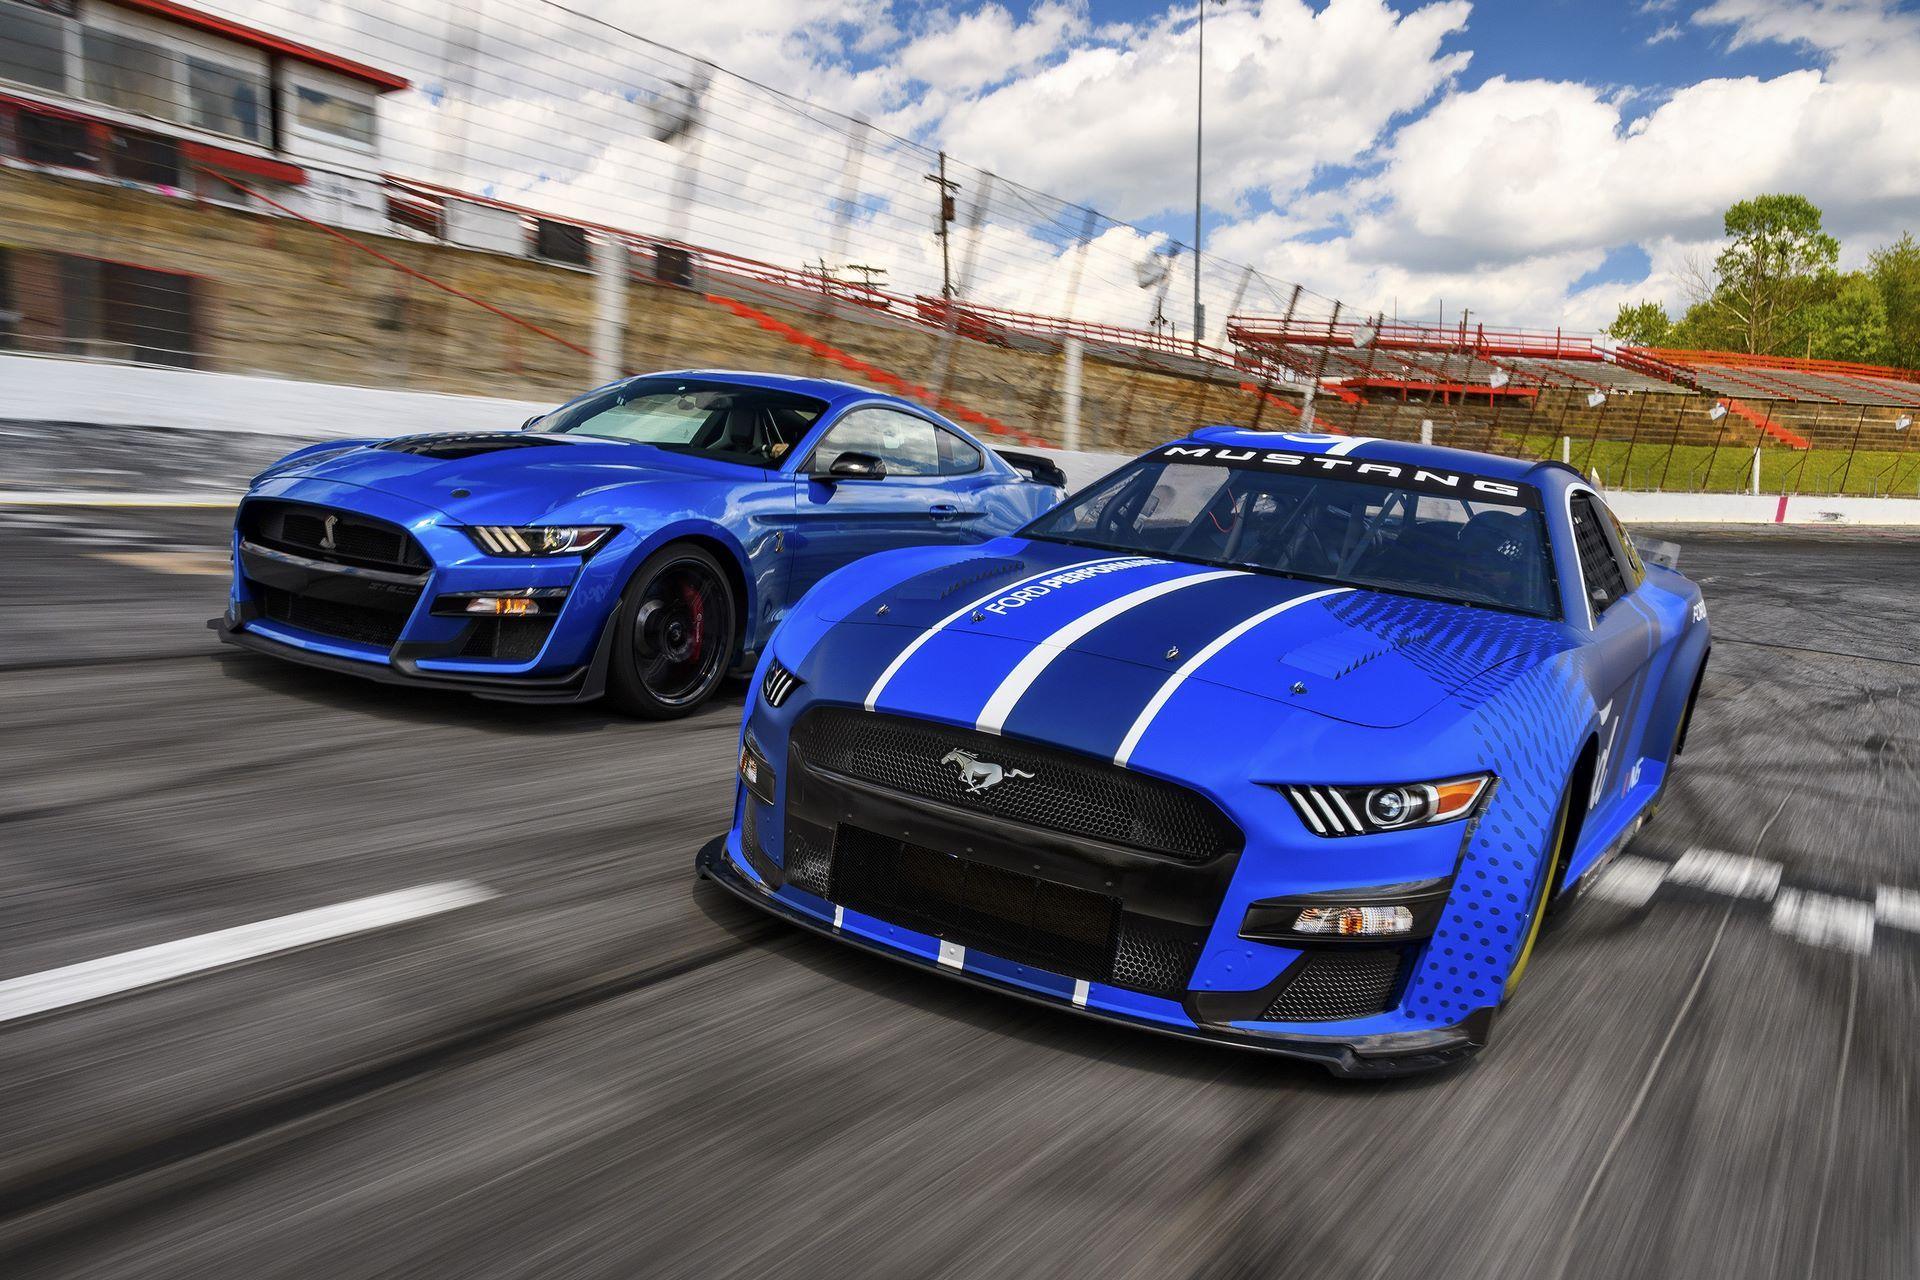 Ford-Mustang-Next-Gen-Nascar-3